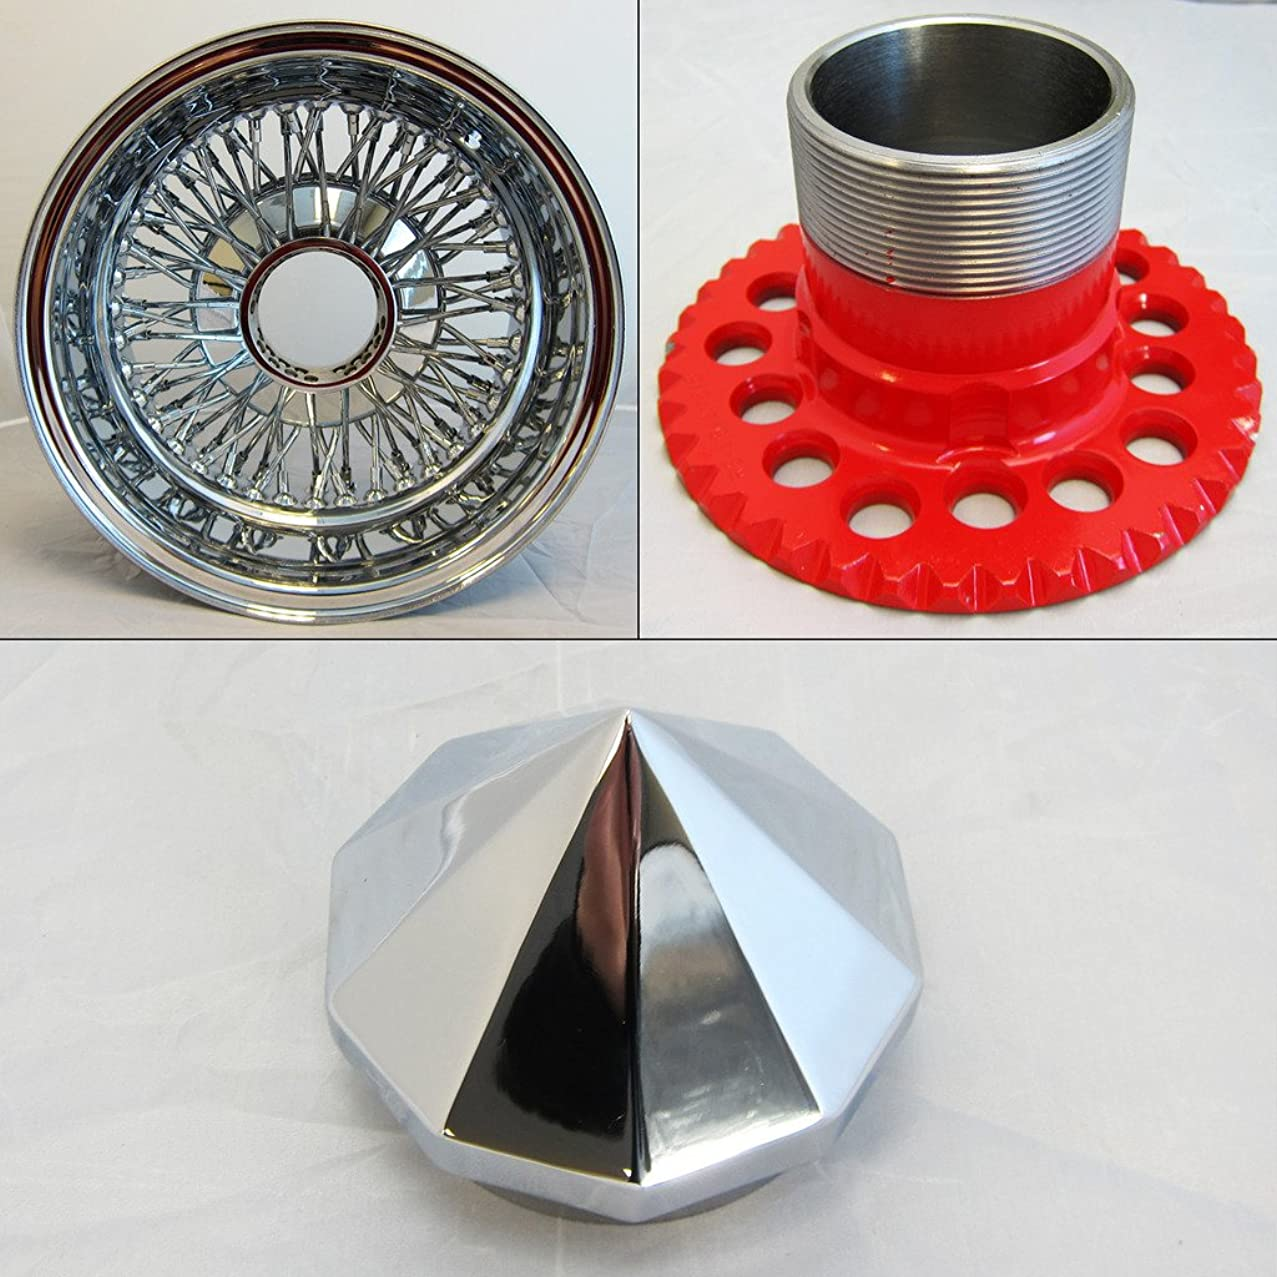 DONGFANG 14x7 REV Recerse 72 Spoke Wire Wheels Cross Lace Chrome Rims 4pcs